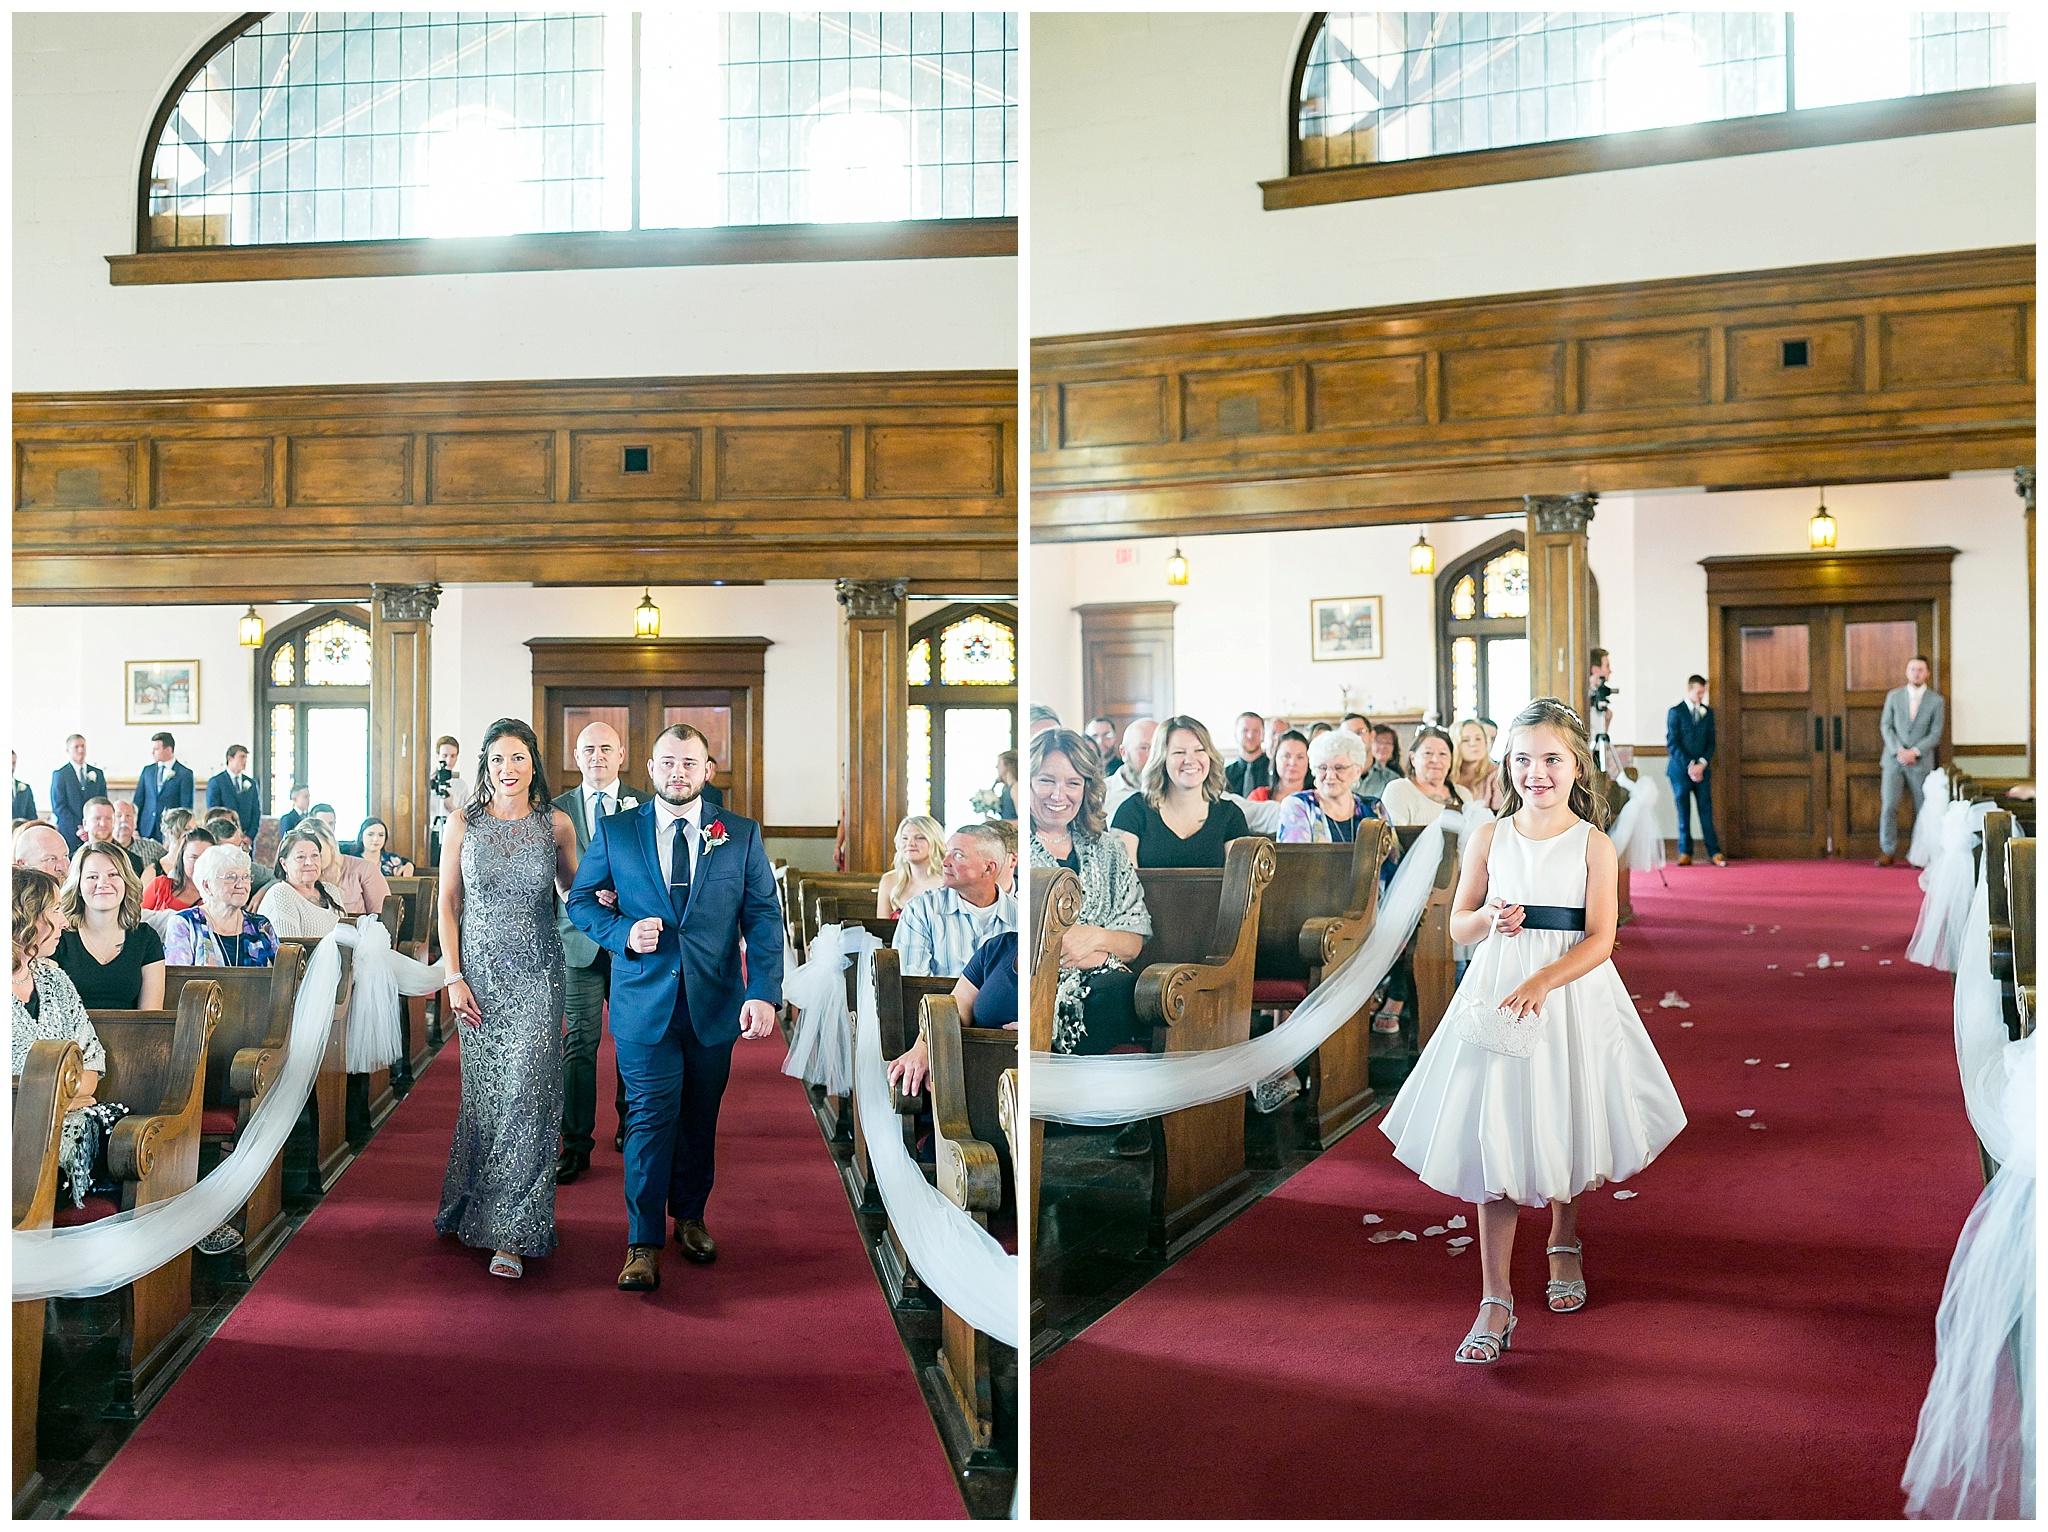 la_casa_grande_wedding_beloit_wisconsin_caynay_photo_0009.jpg